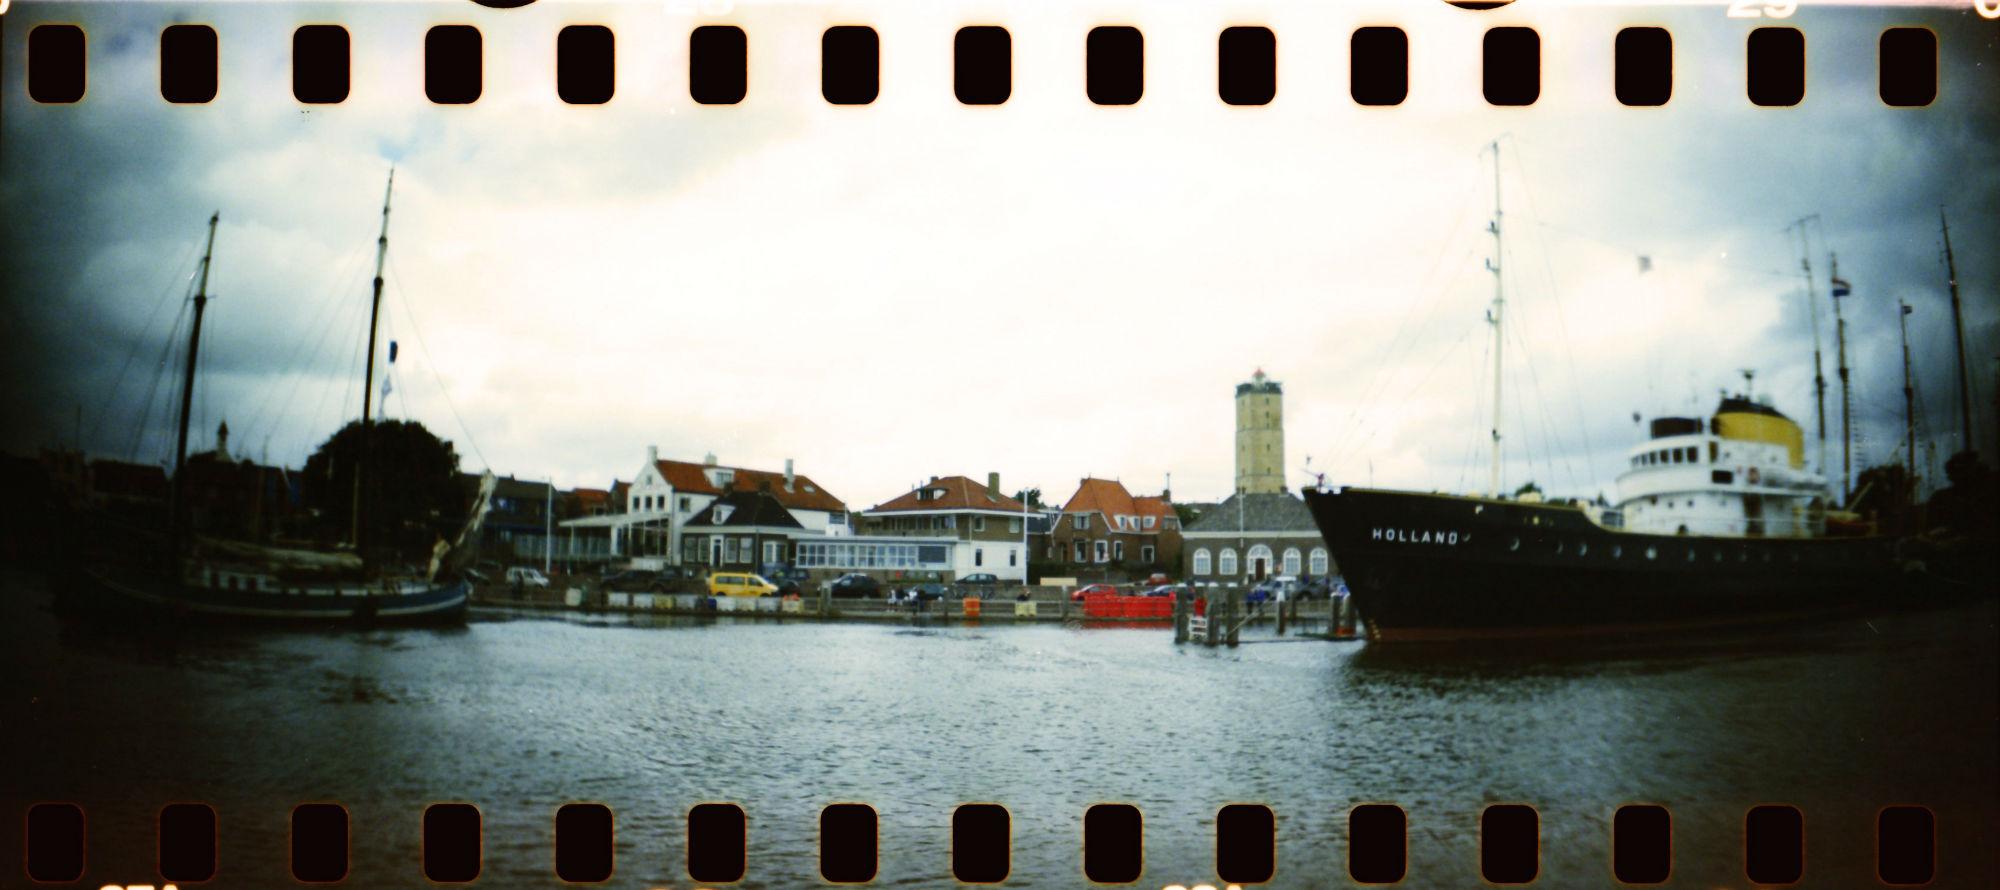 Horizontoer Fryslan Friesland Niederlande Nordholland Wattenmeer (c) Lomoherz